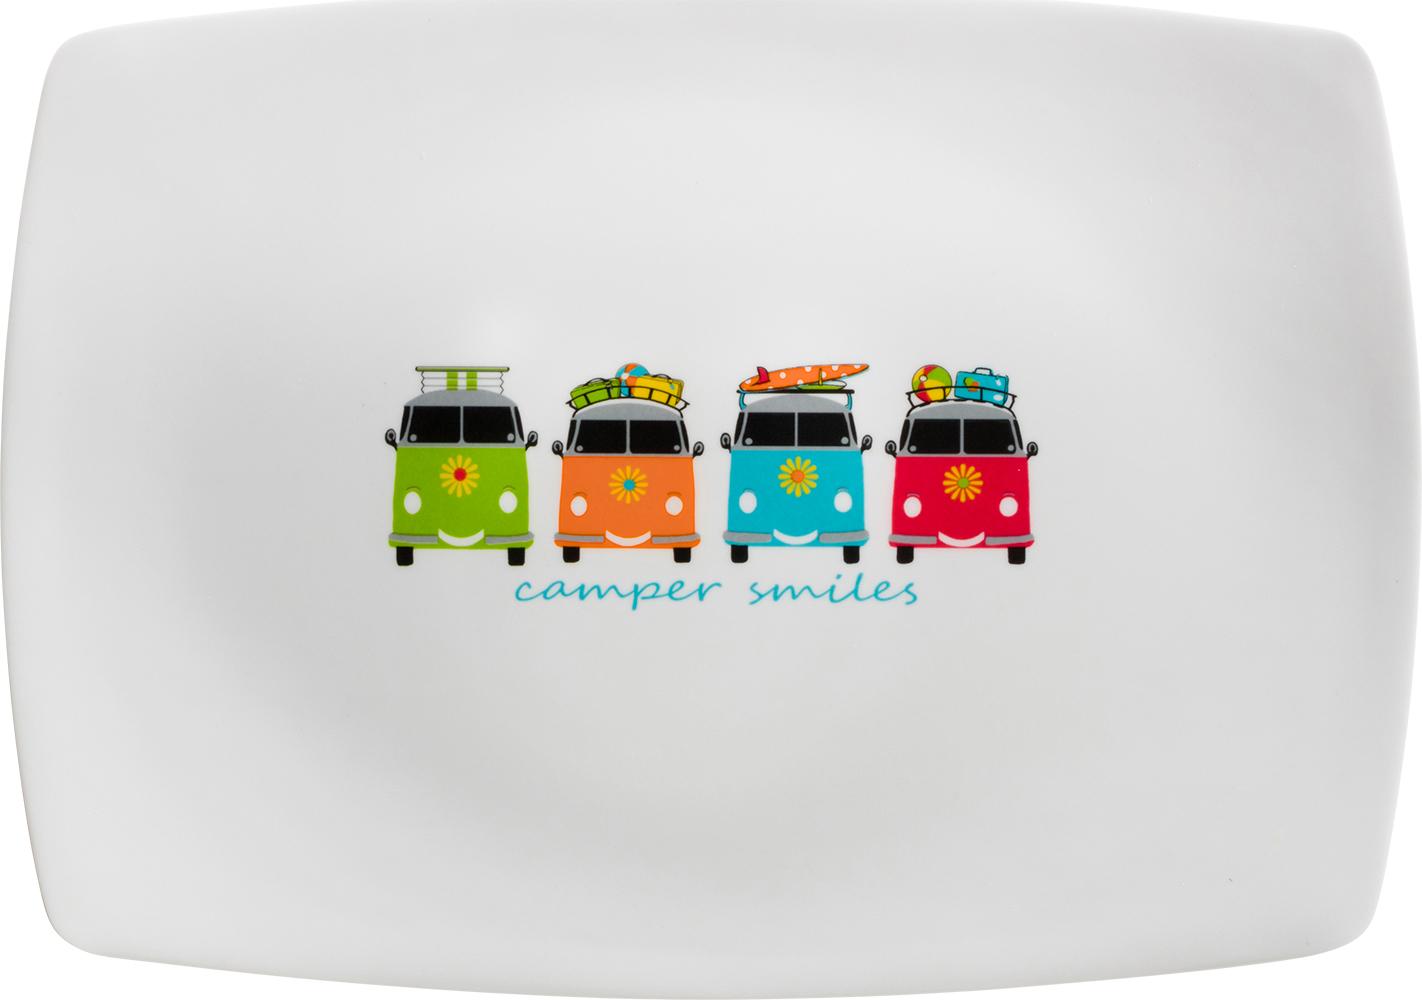 Flamefield Tablett Campers Smiles